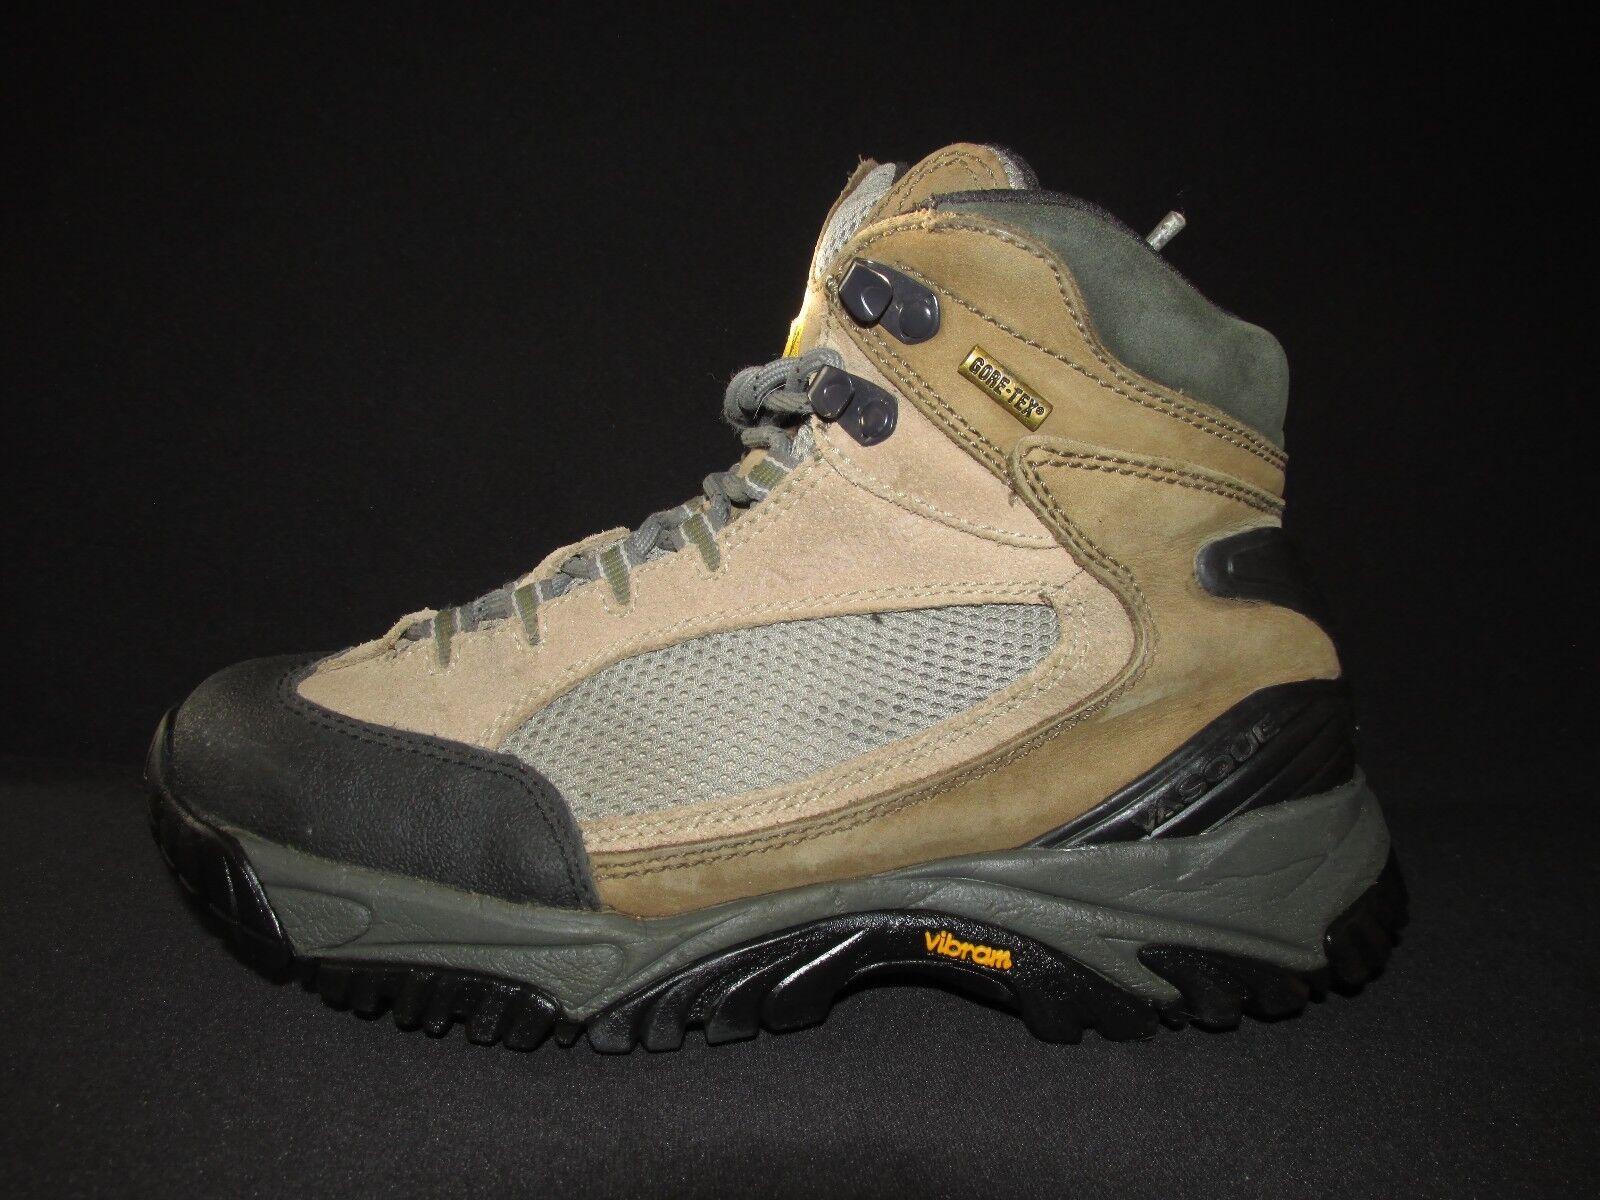 Vasque Gore-Tex 8.5M Suede Hiking Trail Boot Women's 8.5M Gore-Tex 88b20d